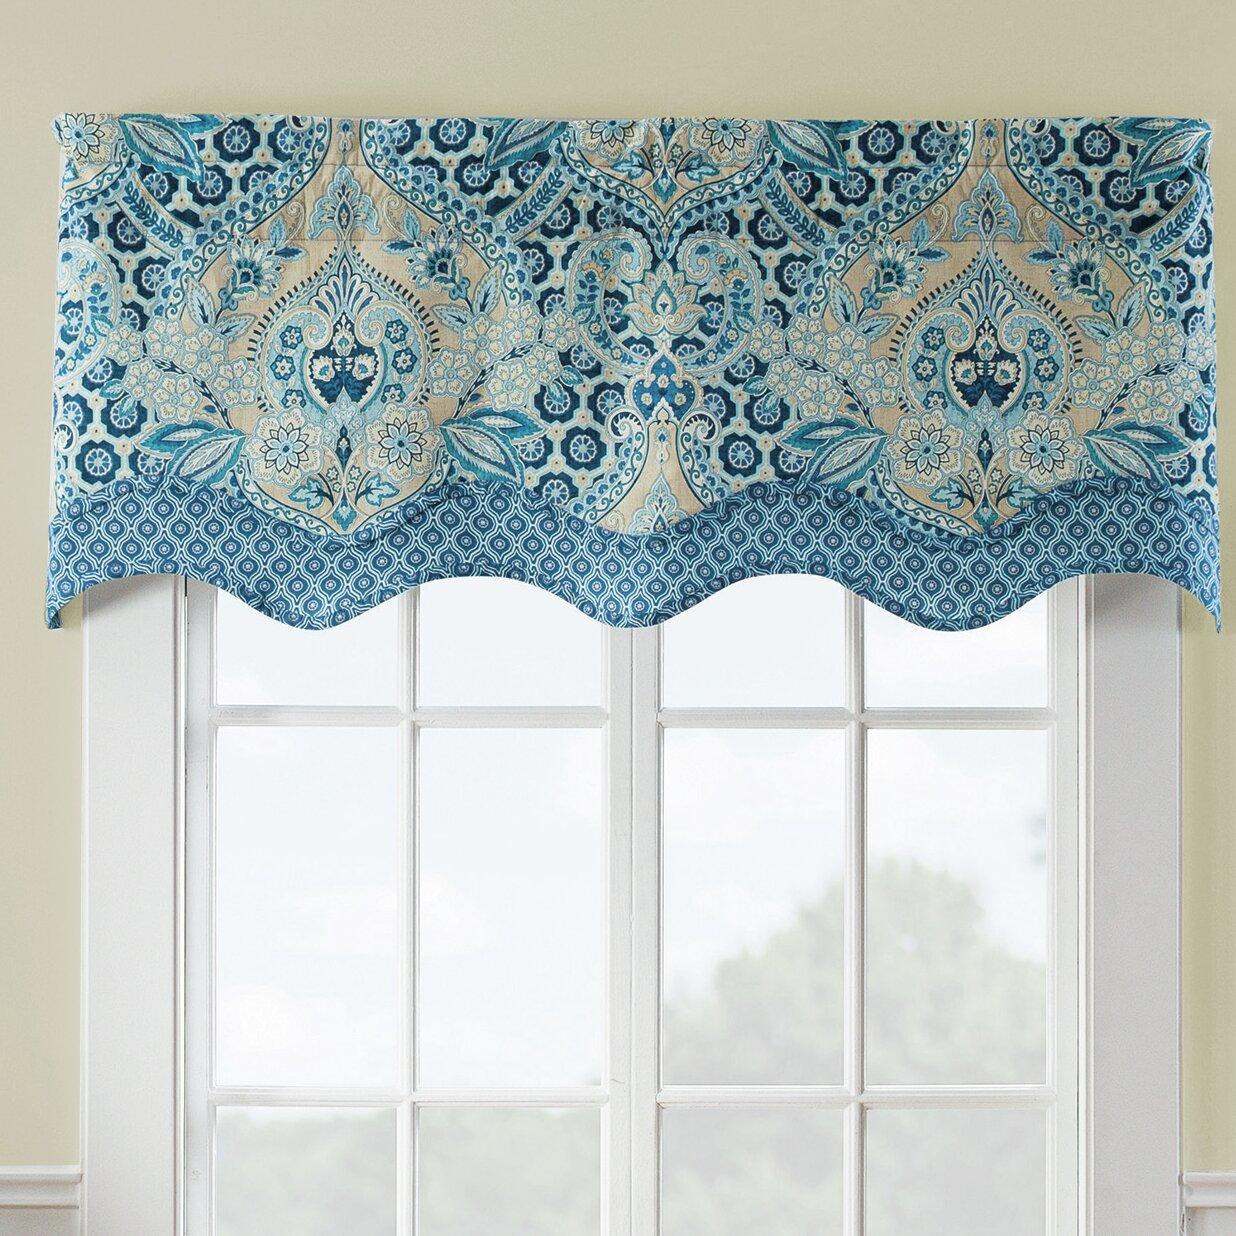 Waverly Moonlit Shadows Wave Window Curtain Valance